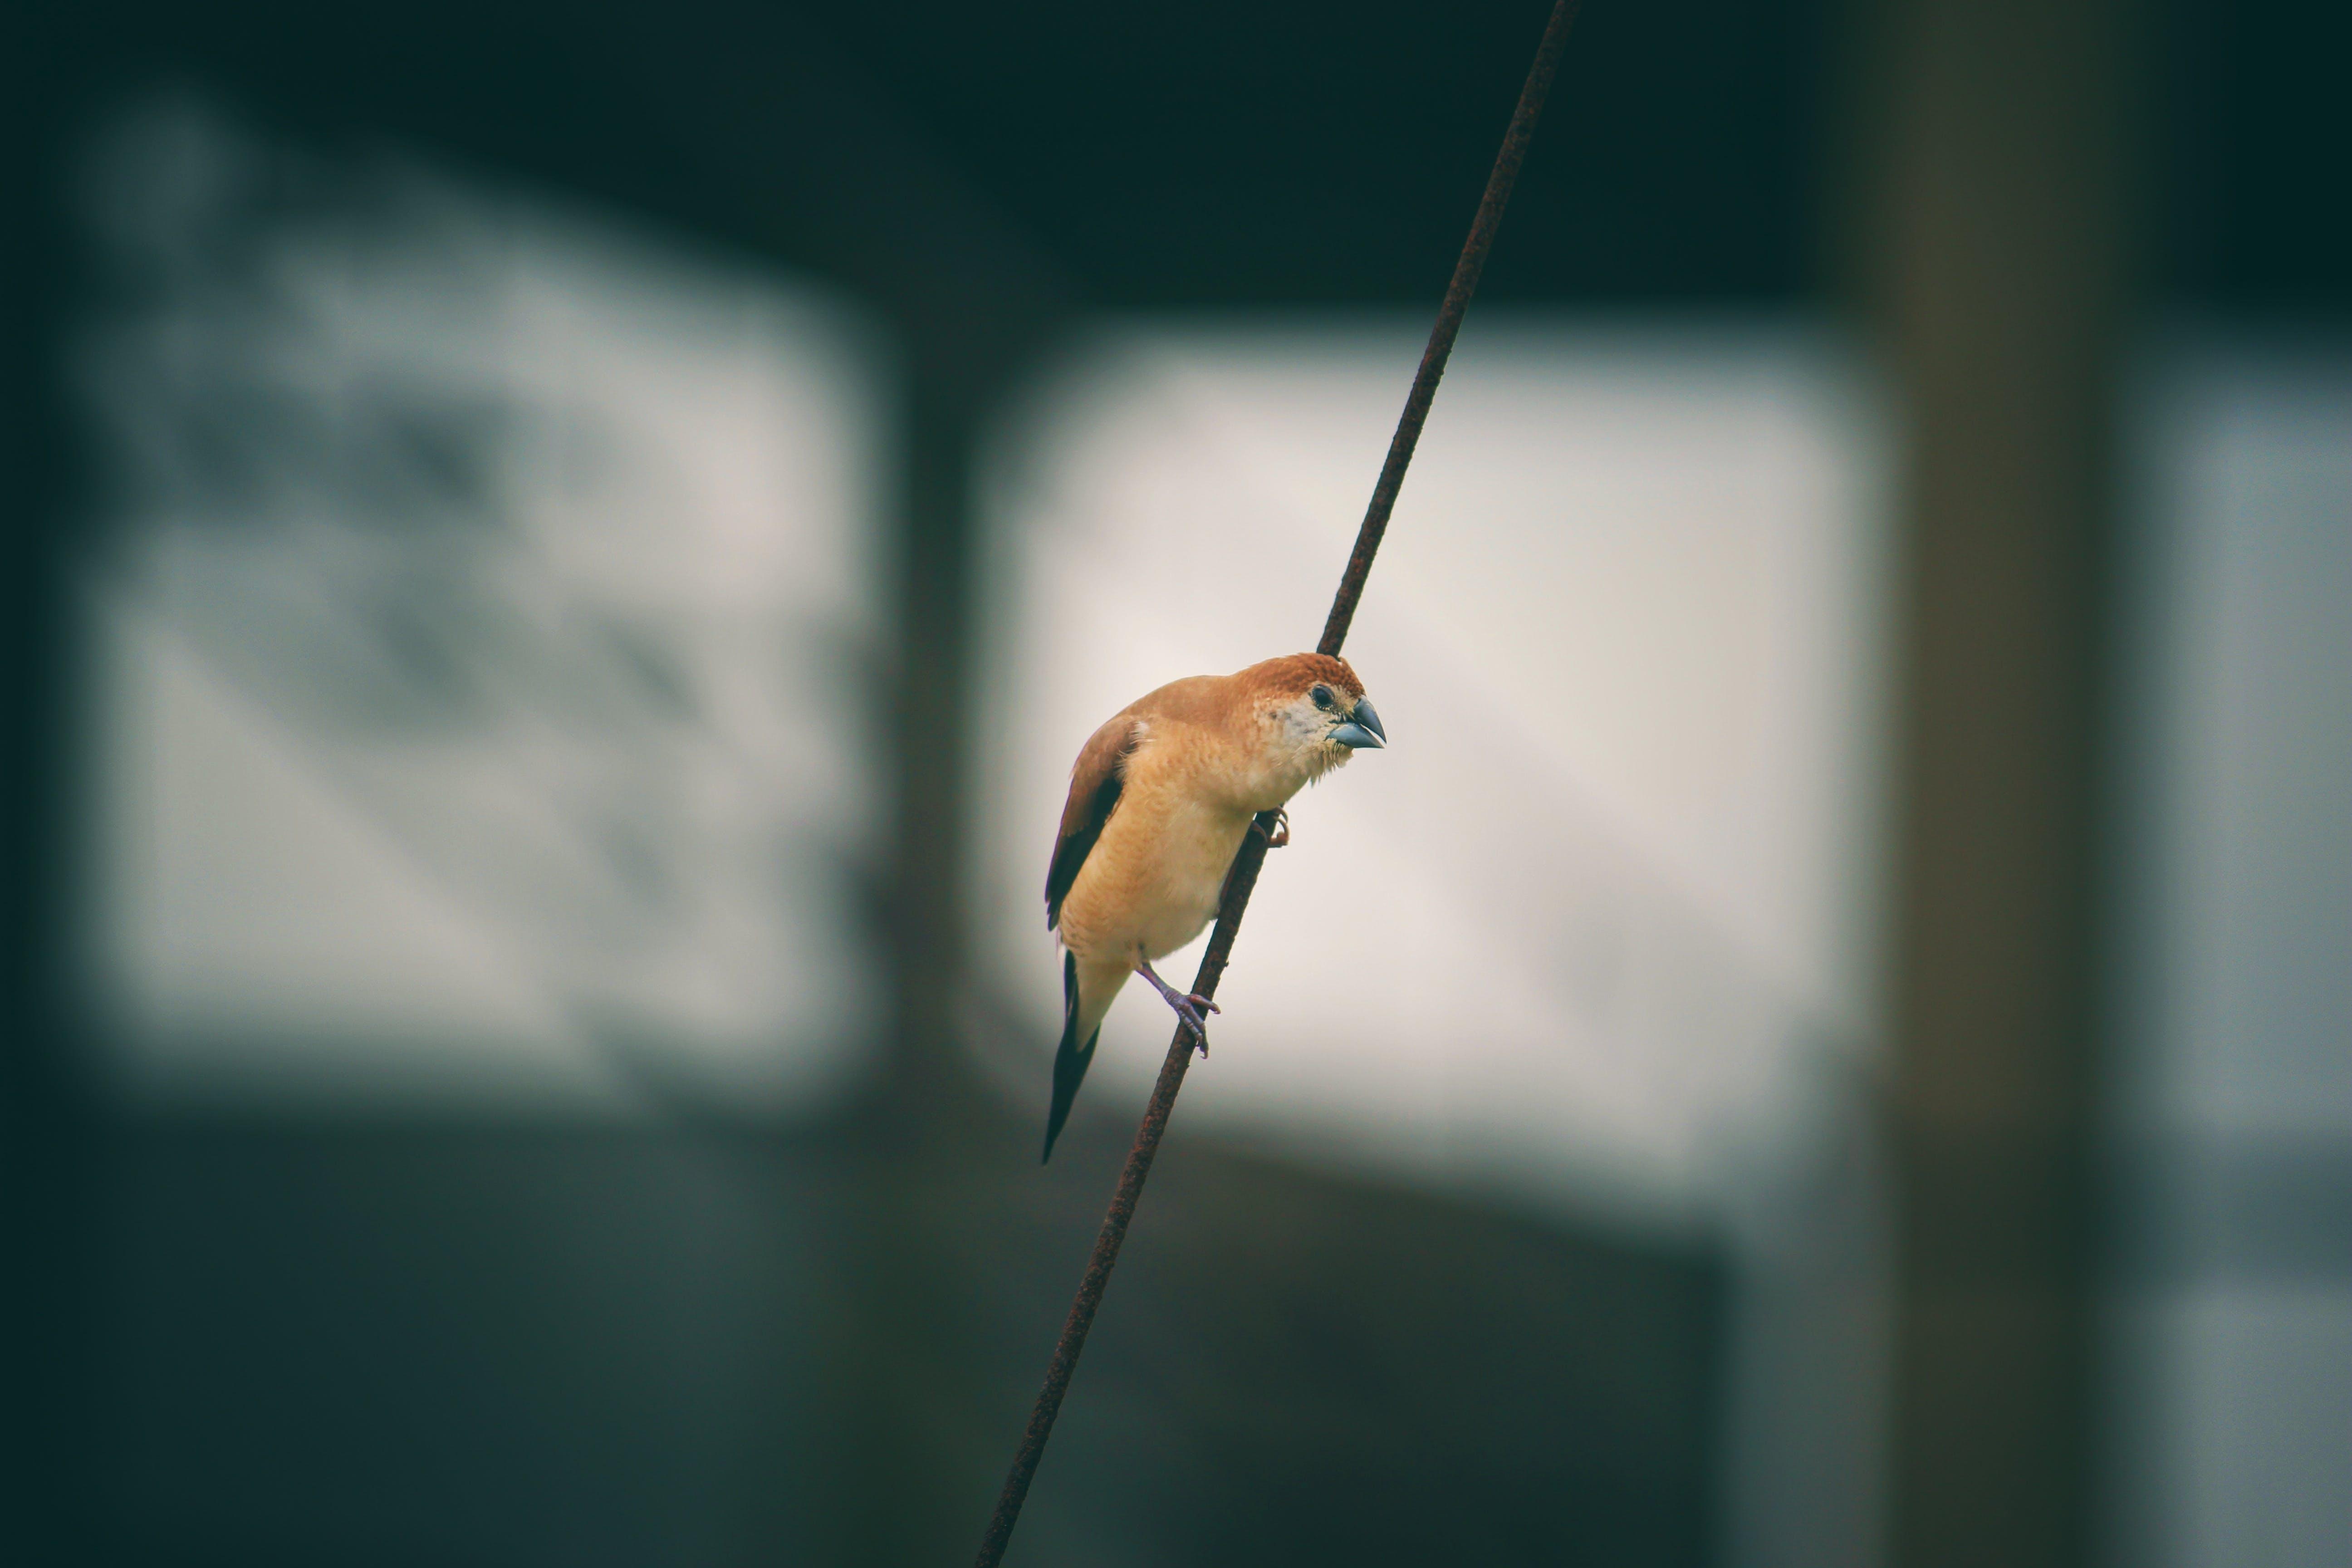 Brown Bird on Black String